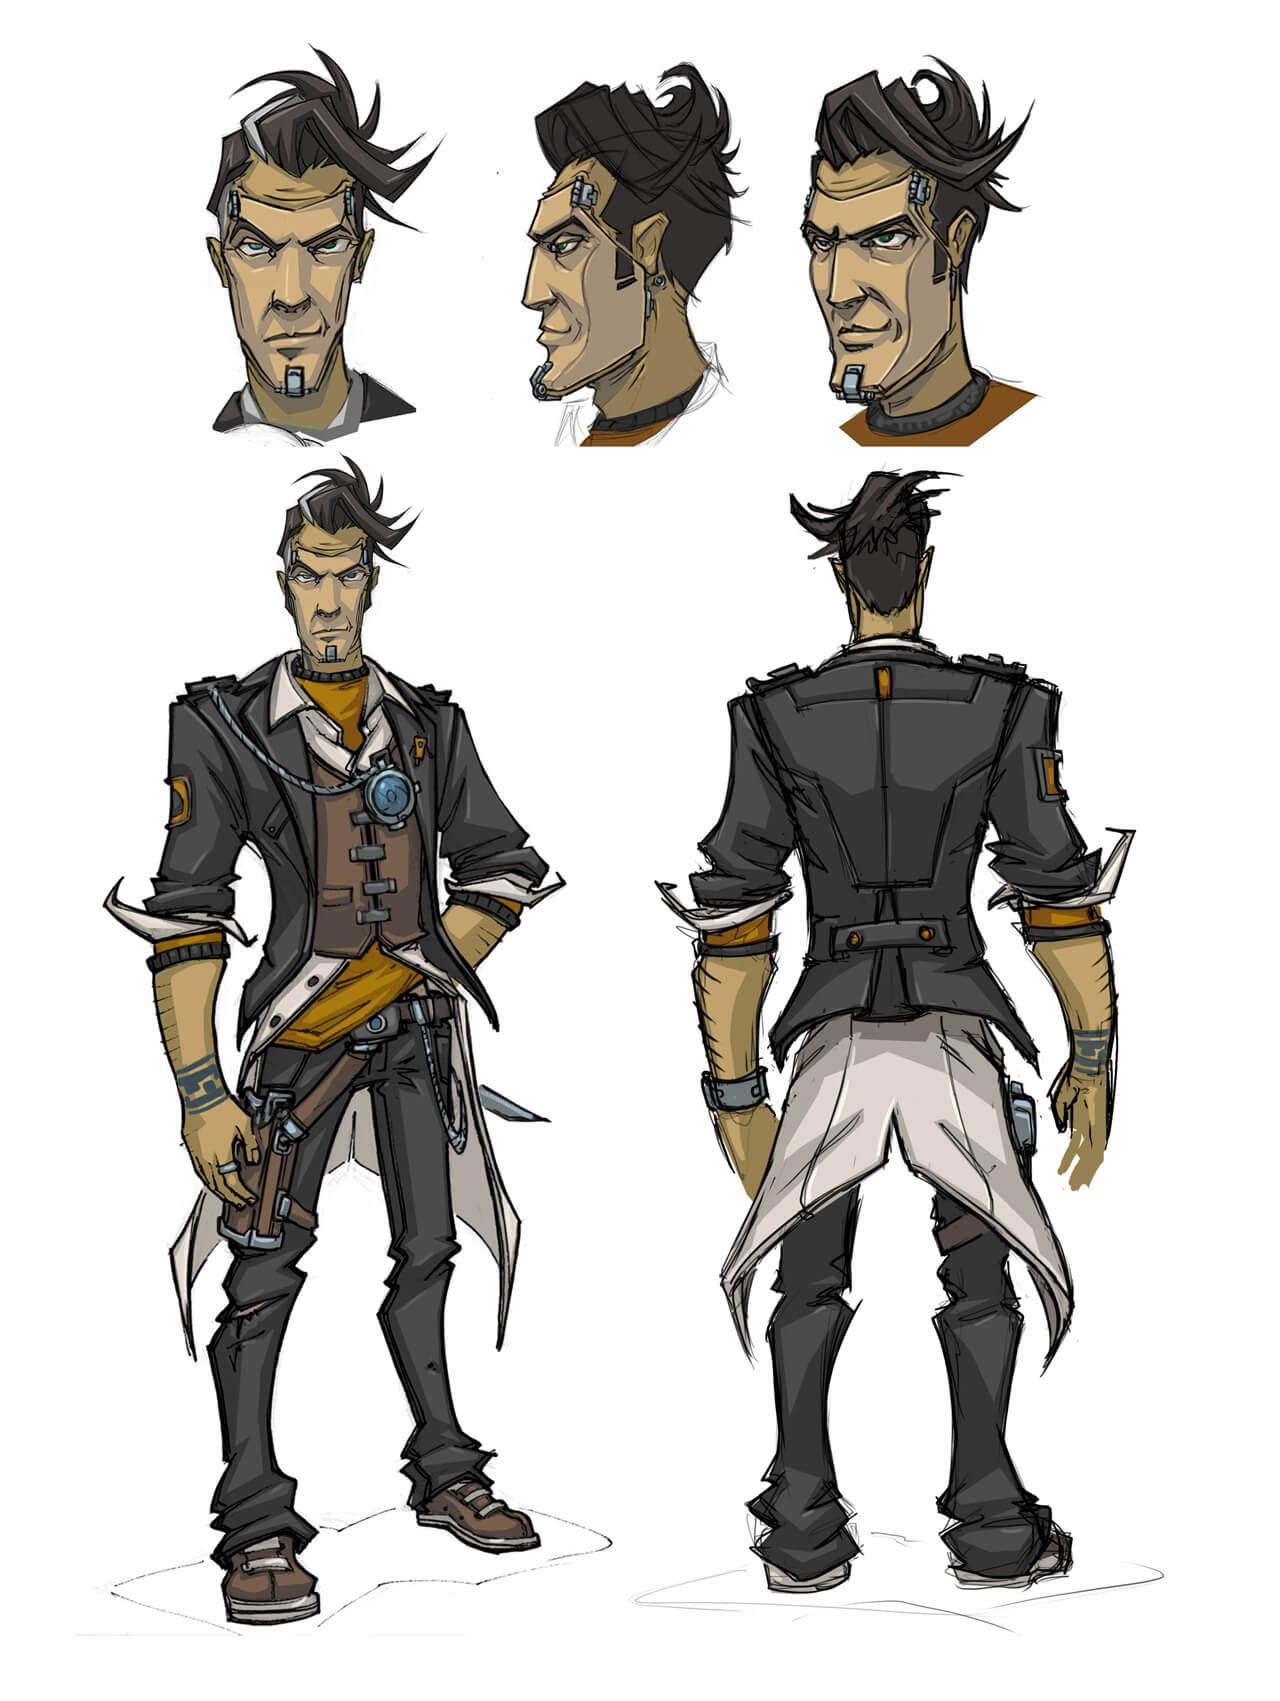 Mission : supporter Tarkan 24J dans le désert [Tarkan, Azel, Ahsoka, Lucie, Johan] - Page 2 Mec_pirates_sable